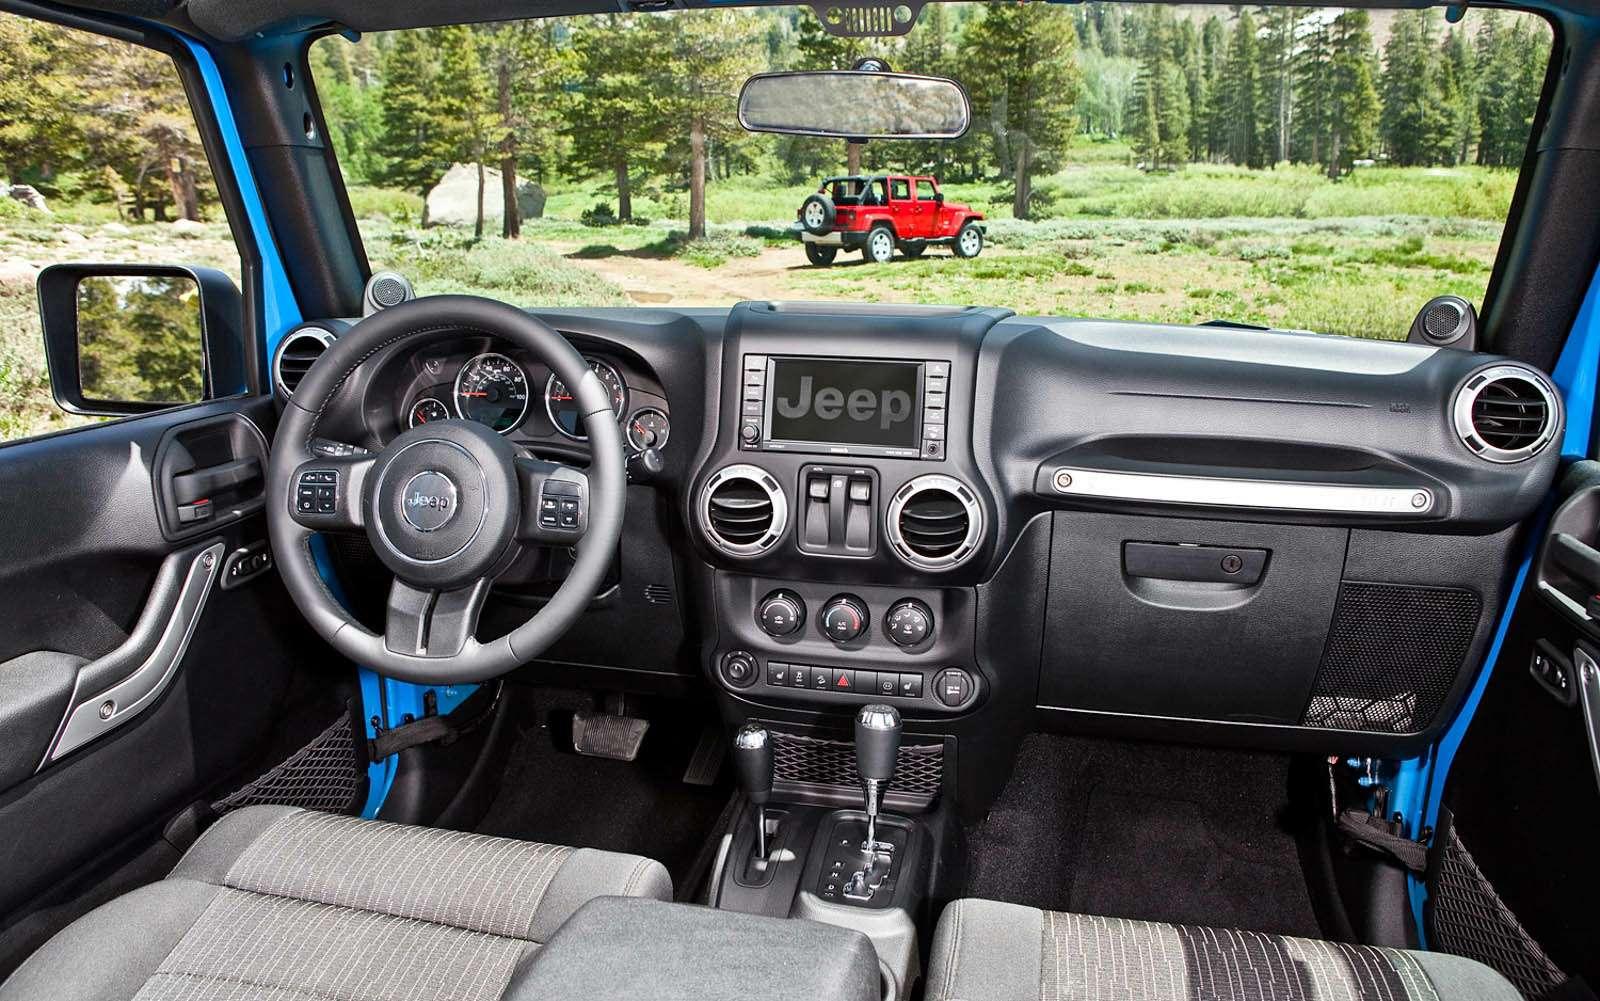 Рамой придавило: Mitsubishi Pajero Sport иокружение— фото 609617